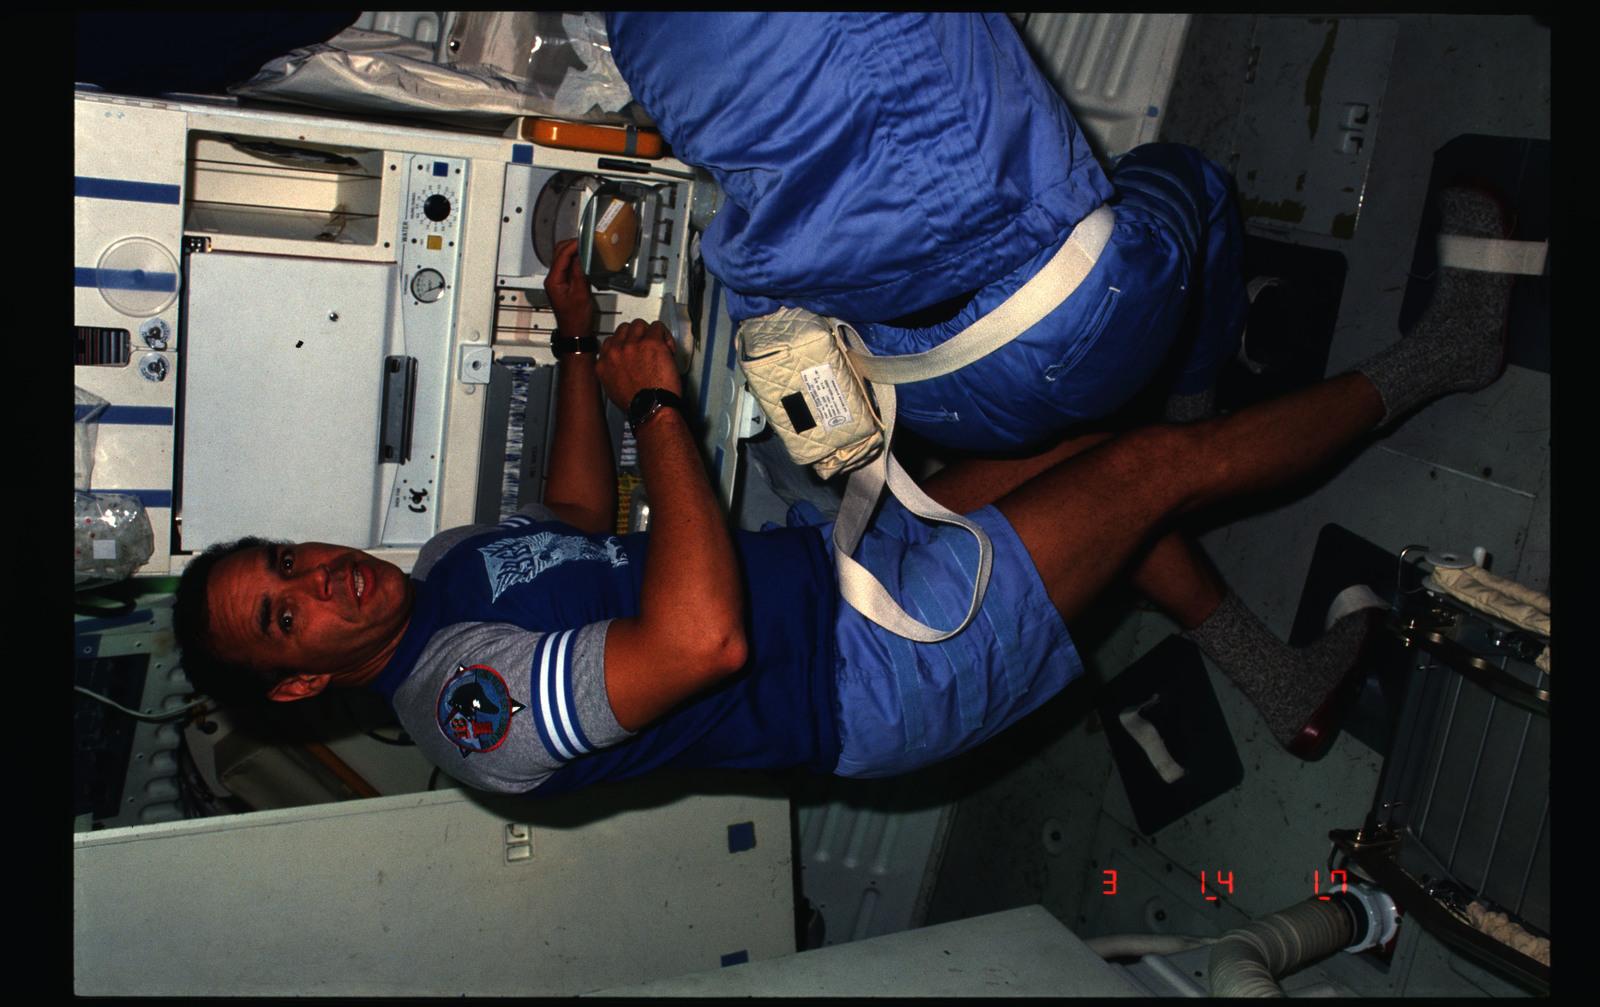 51B-12-002 - STS-51B - 51B crew activities